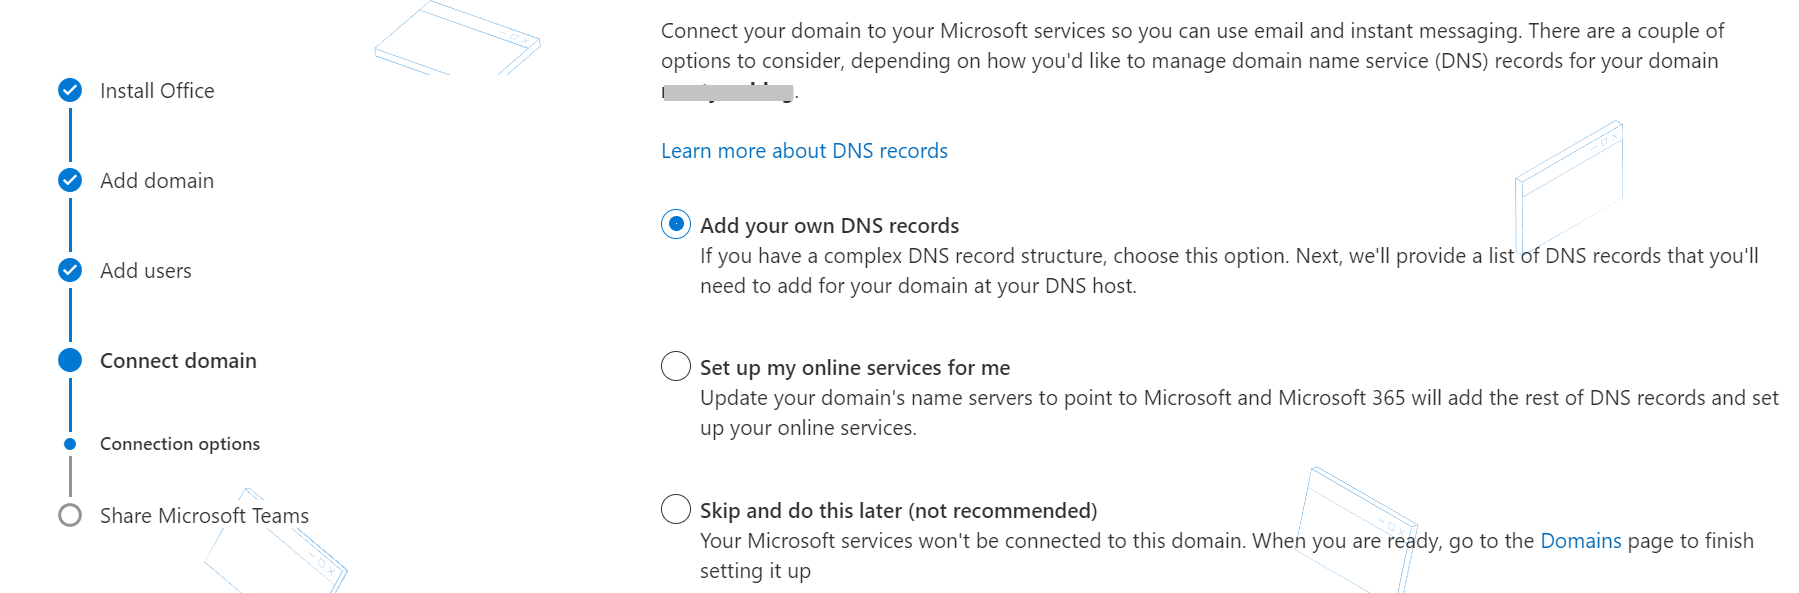 Configurar servicios en línea con Office 365.